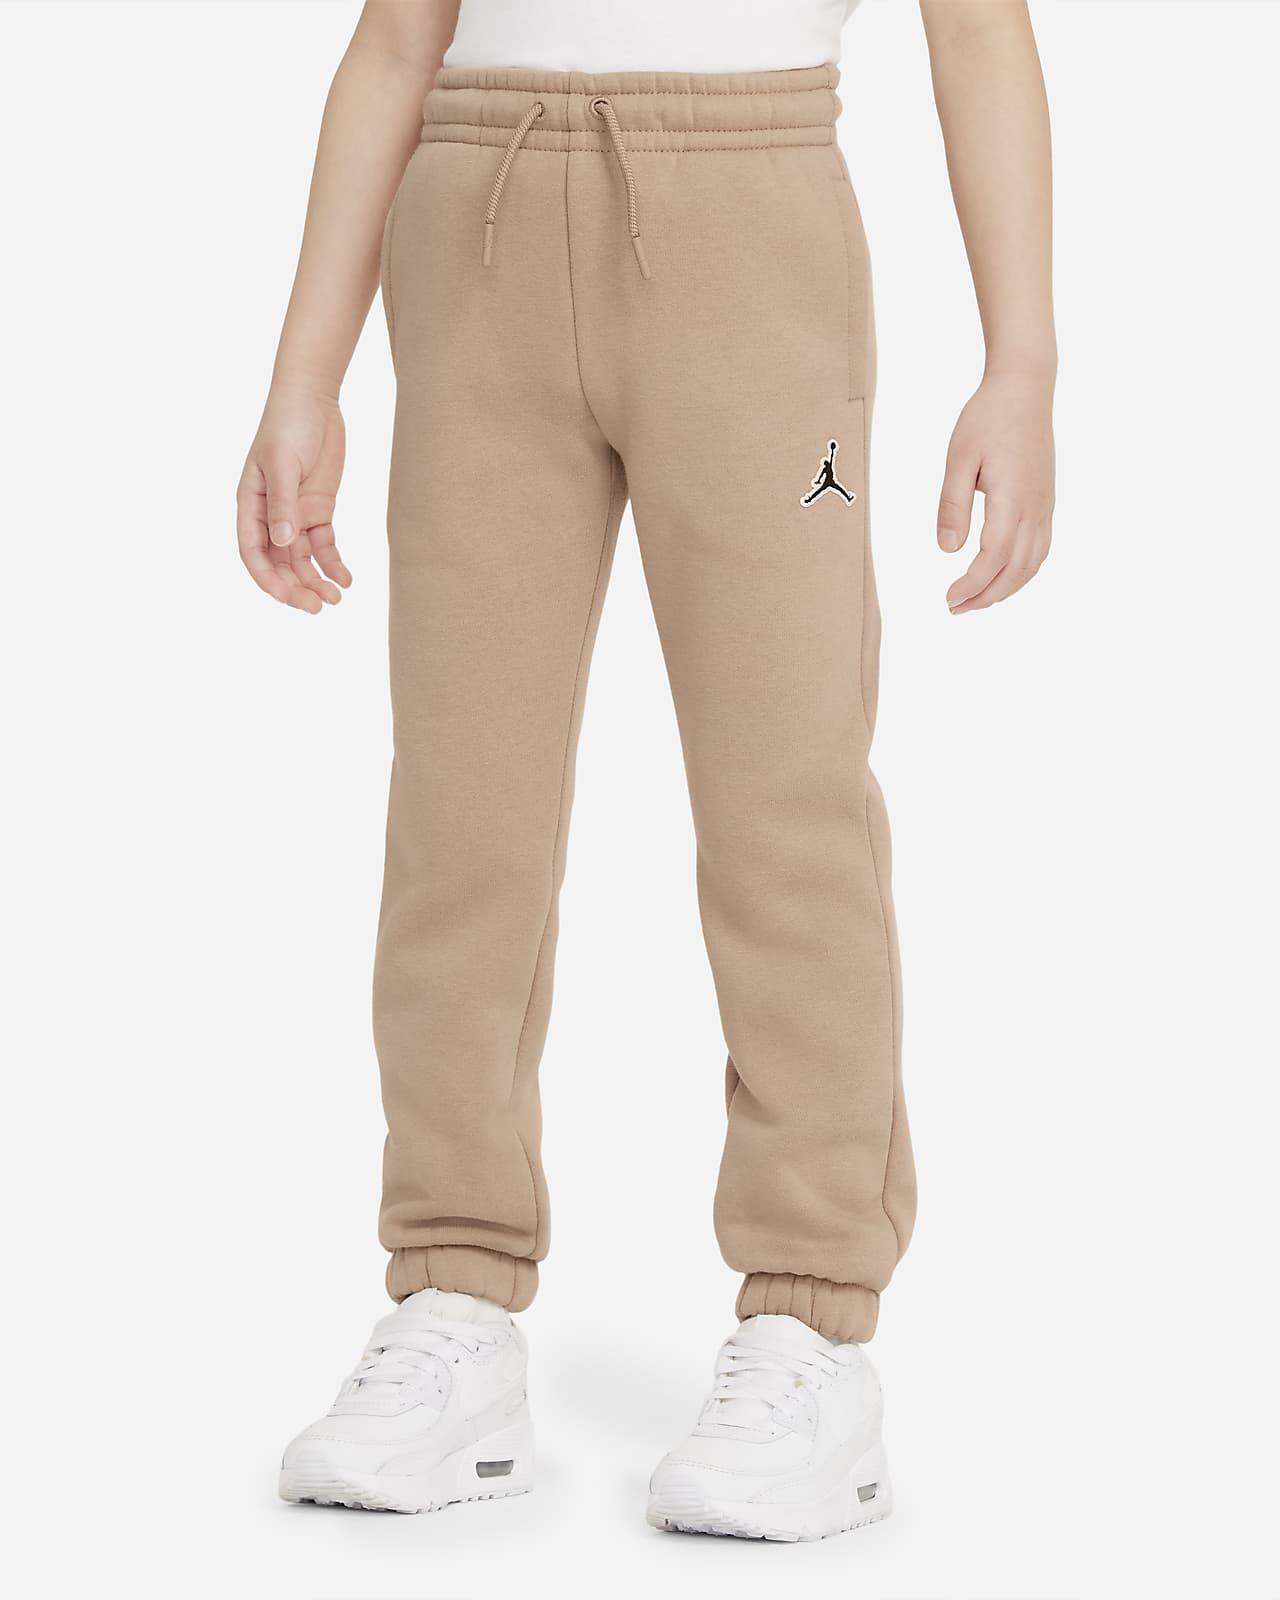 Pantalones para niño talla pequeña Jordan